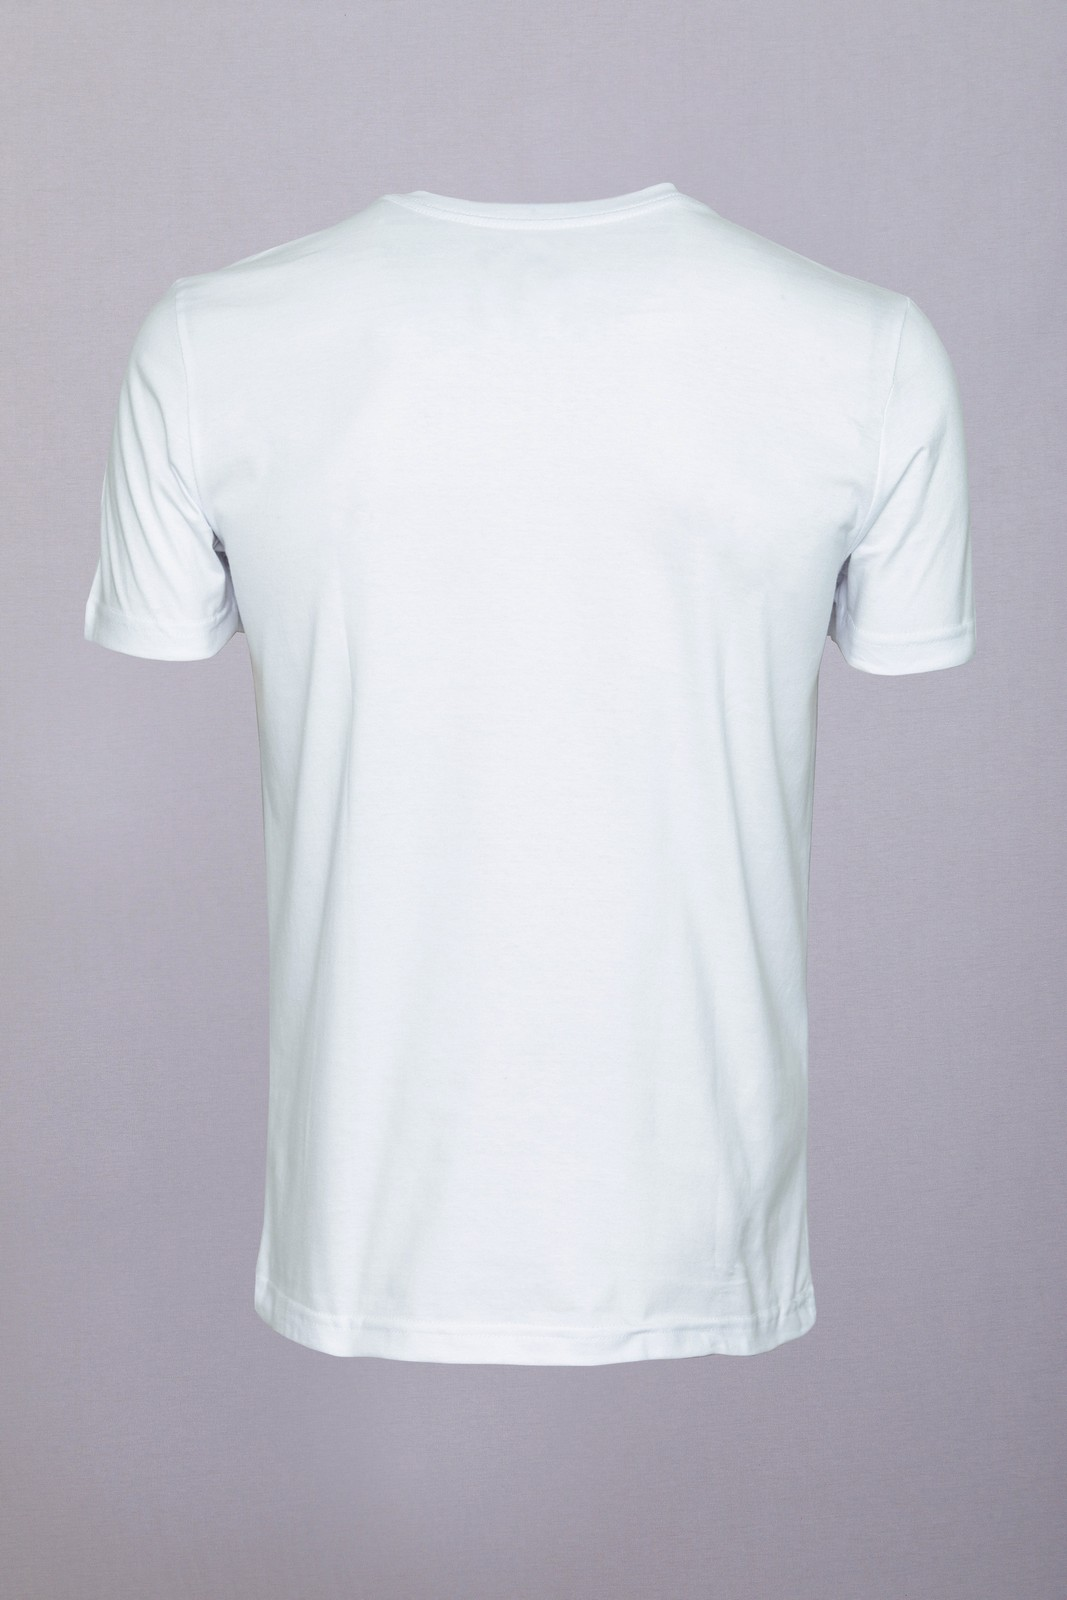 Camiseta Coolwave Liberdade Branca